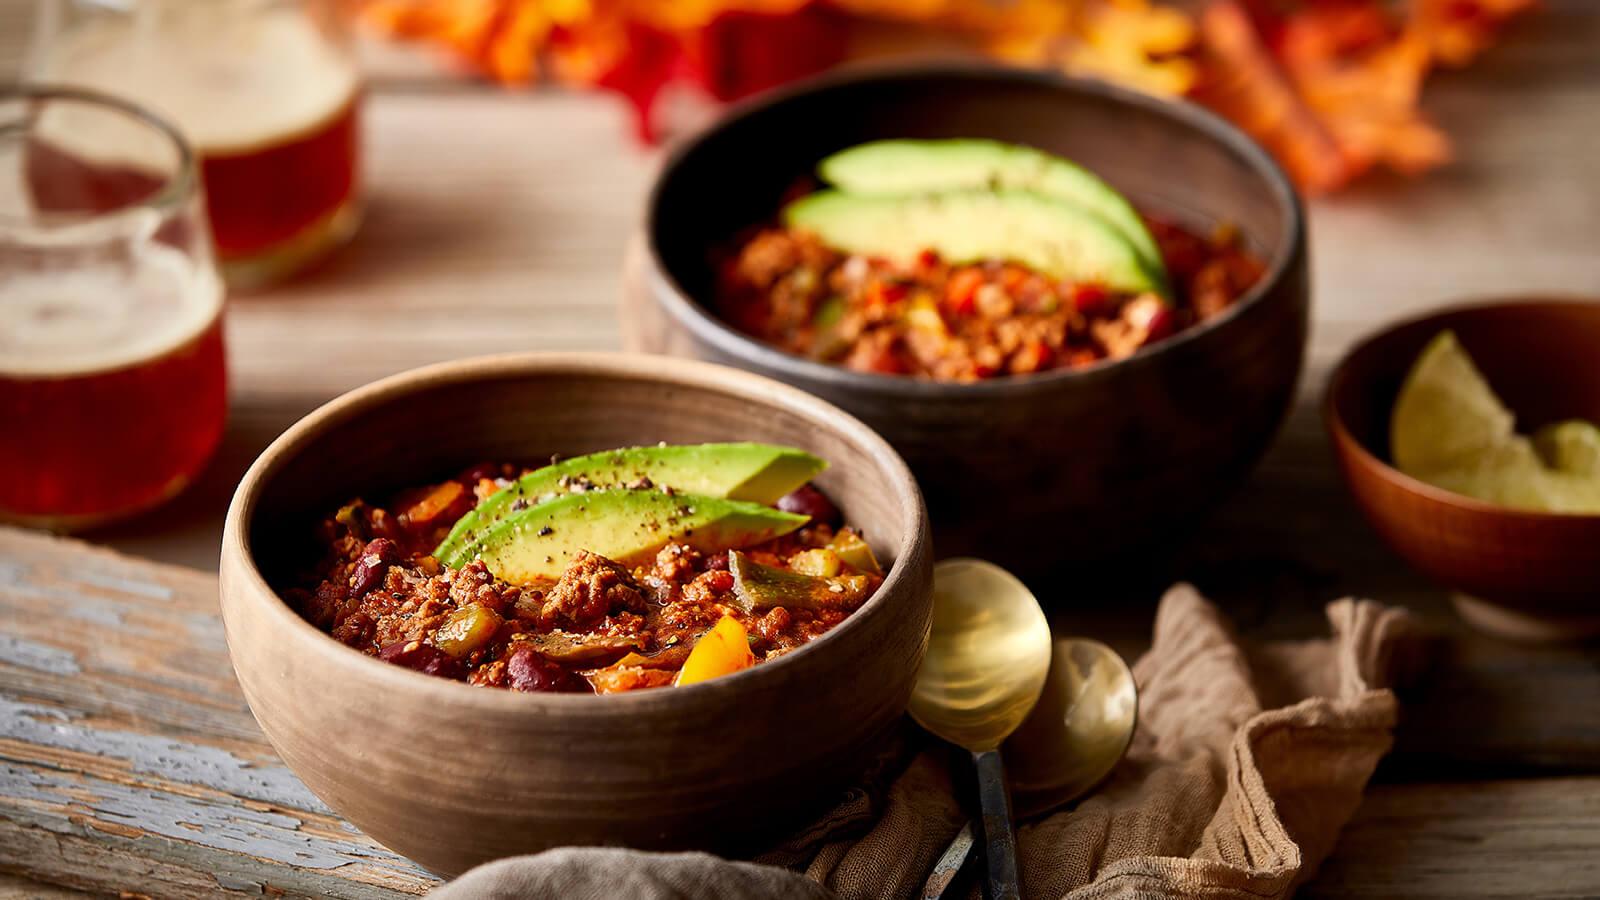 Easy Weeknight Beef Chili Recipe The Fresh Market